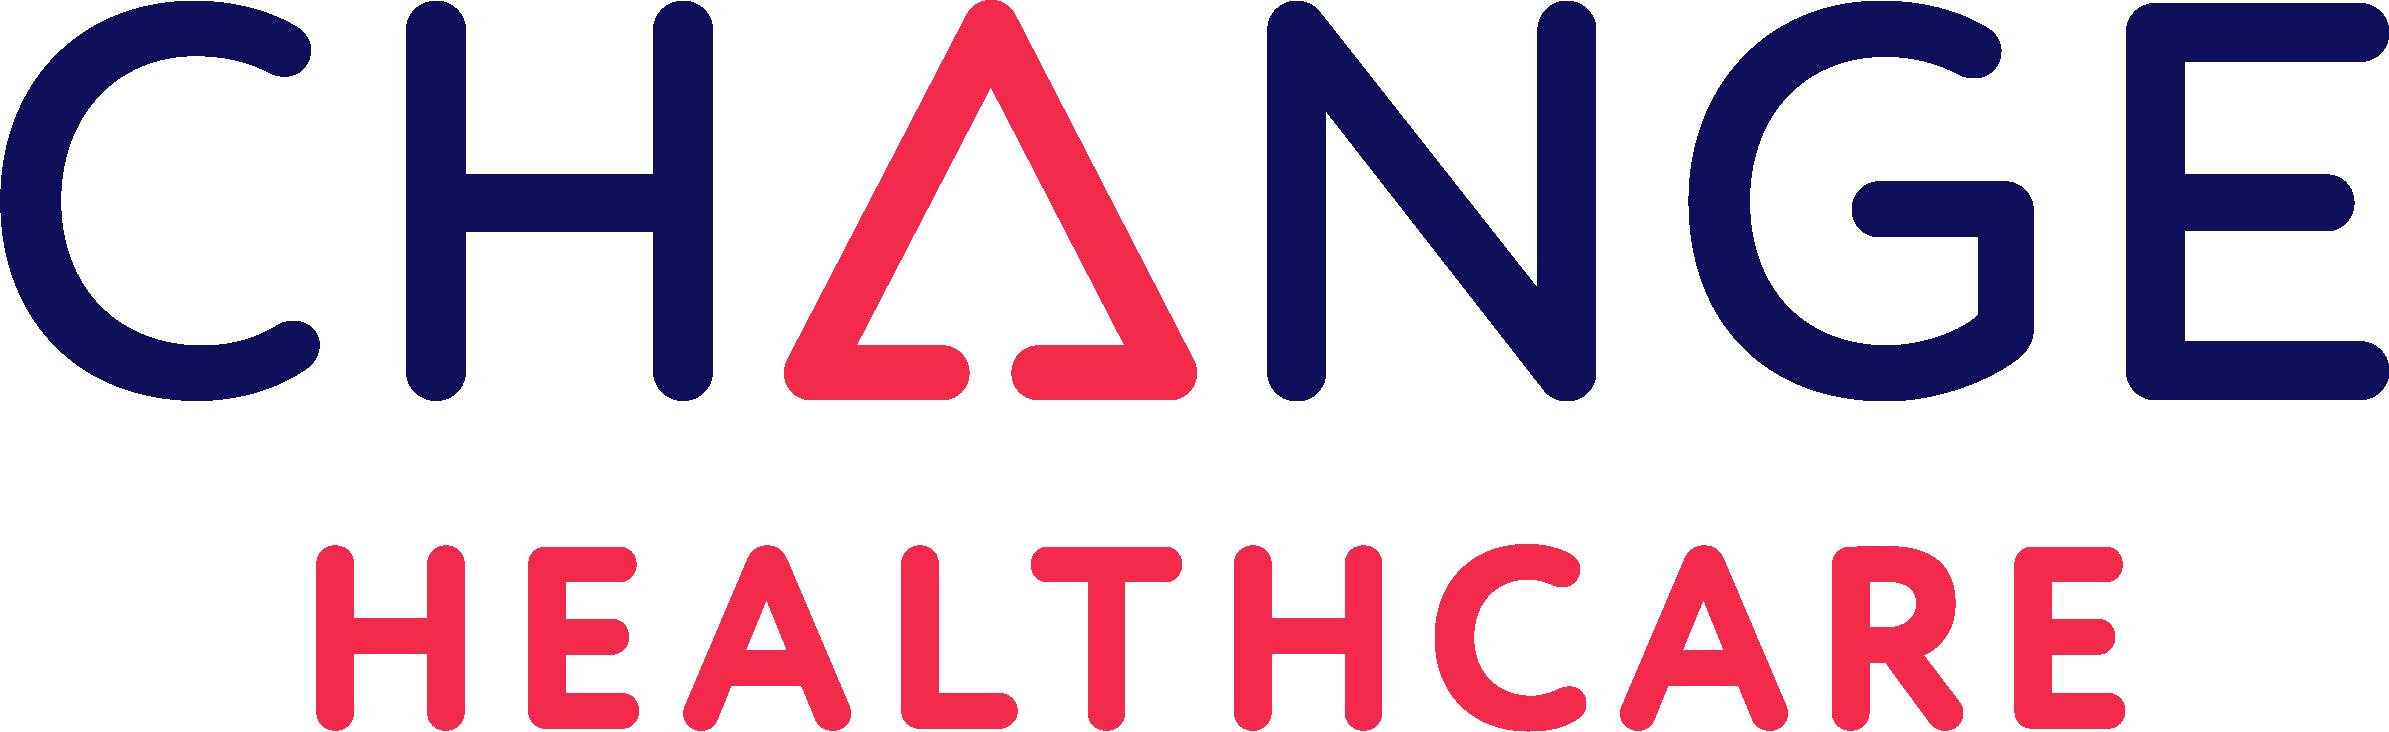 Change Healthcare logo 2017 (2)